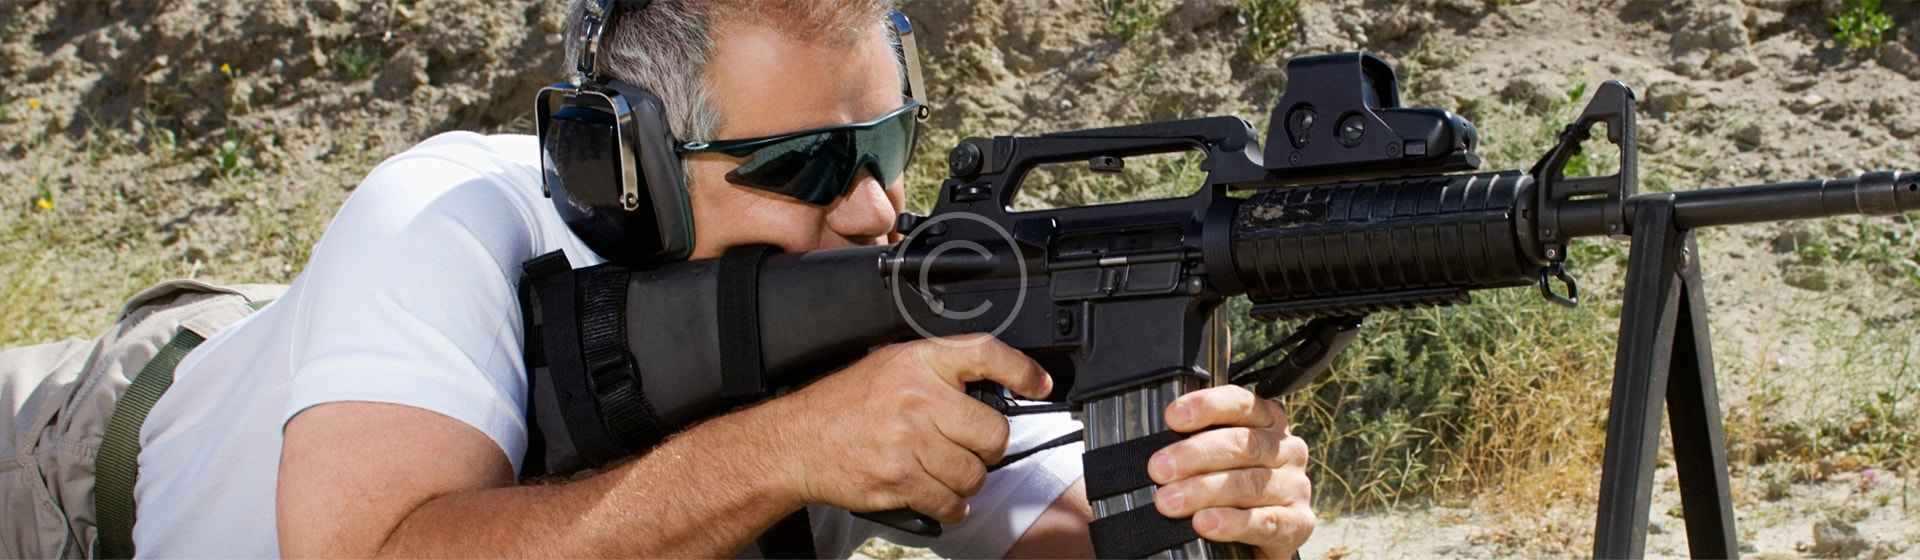 Pistol Caliber Carbine Level 2